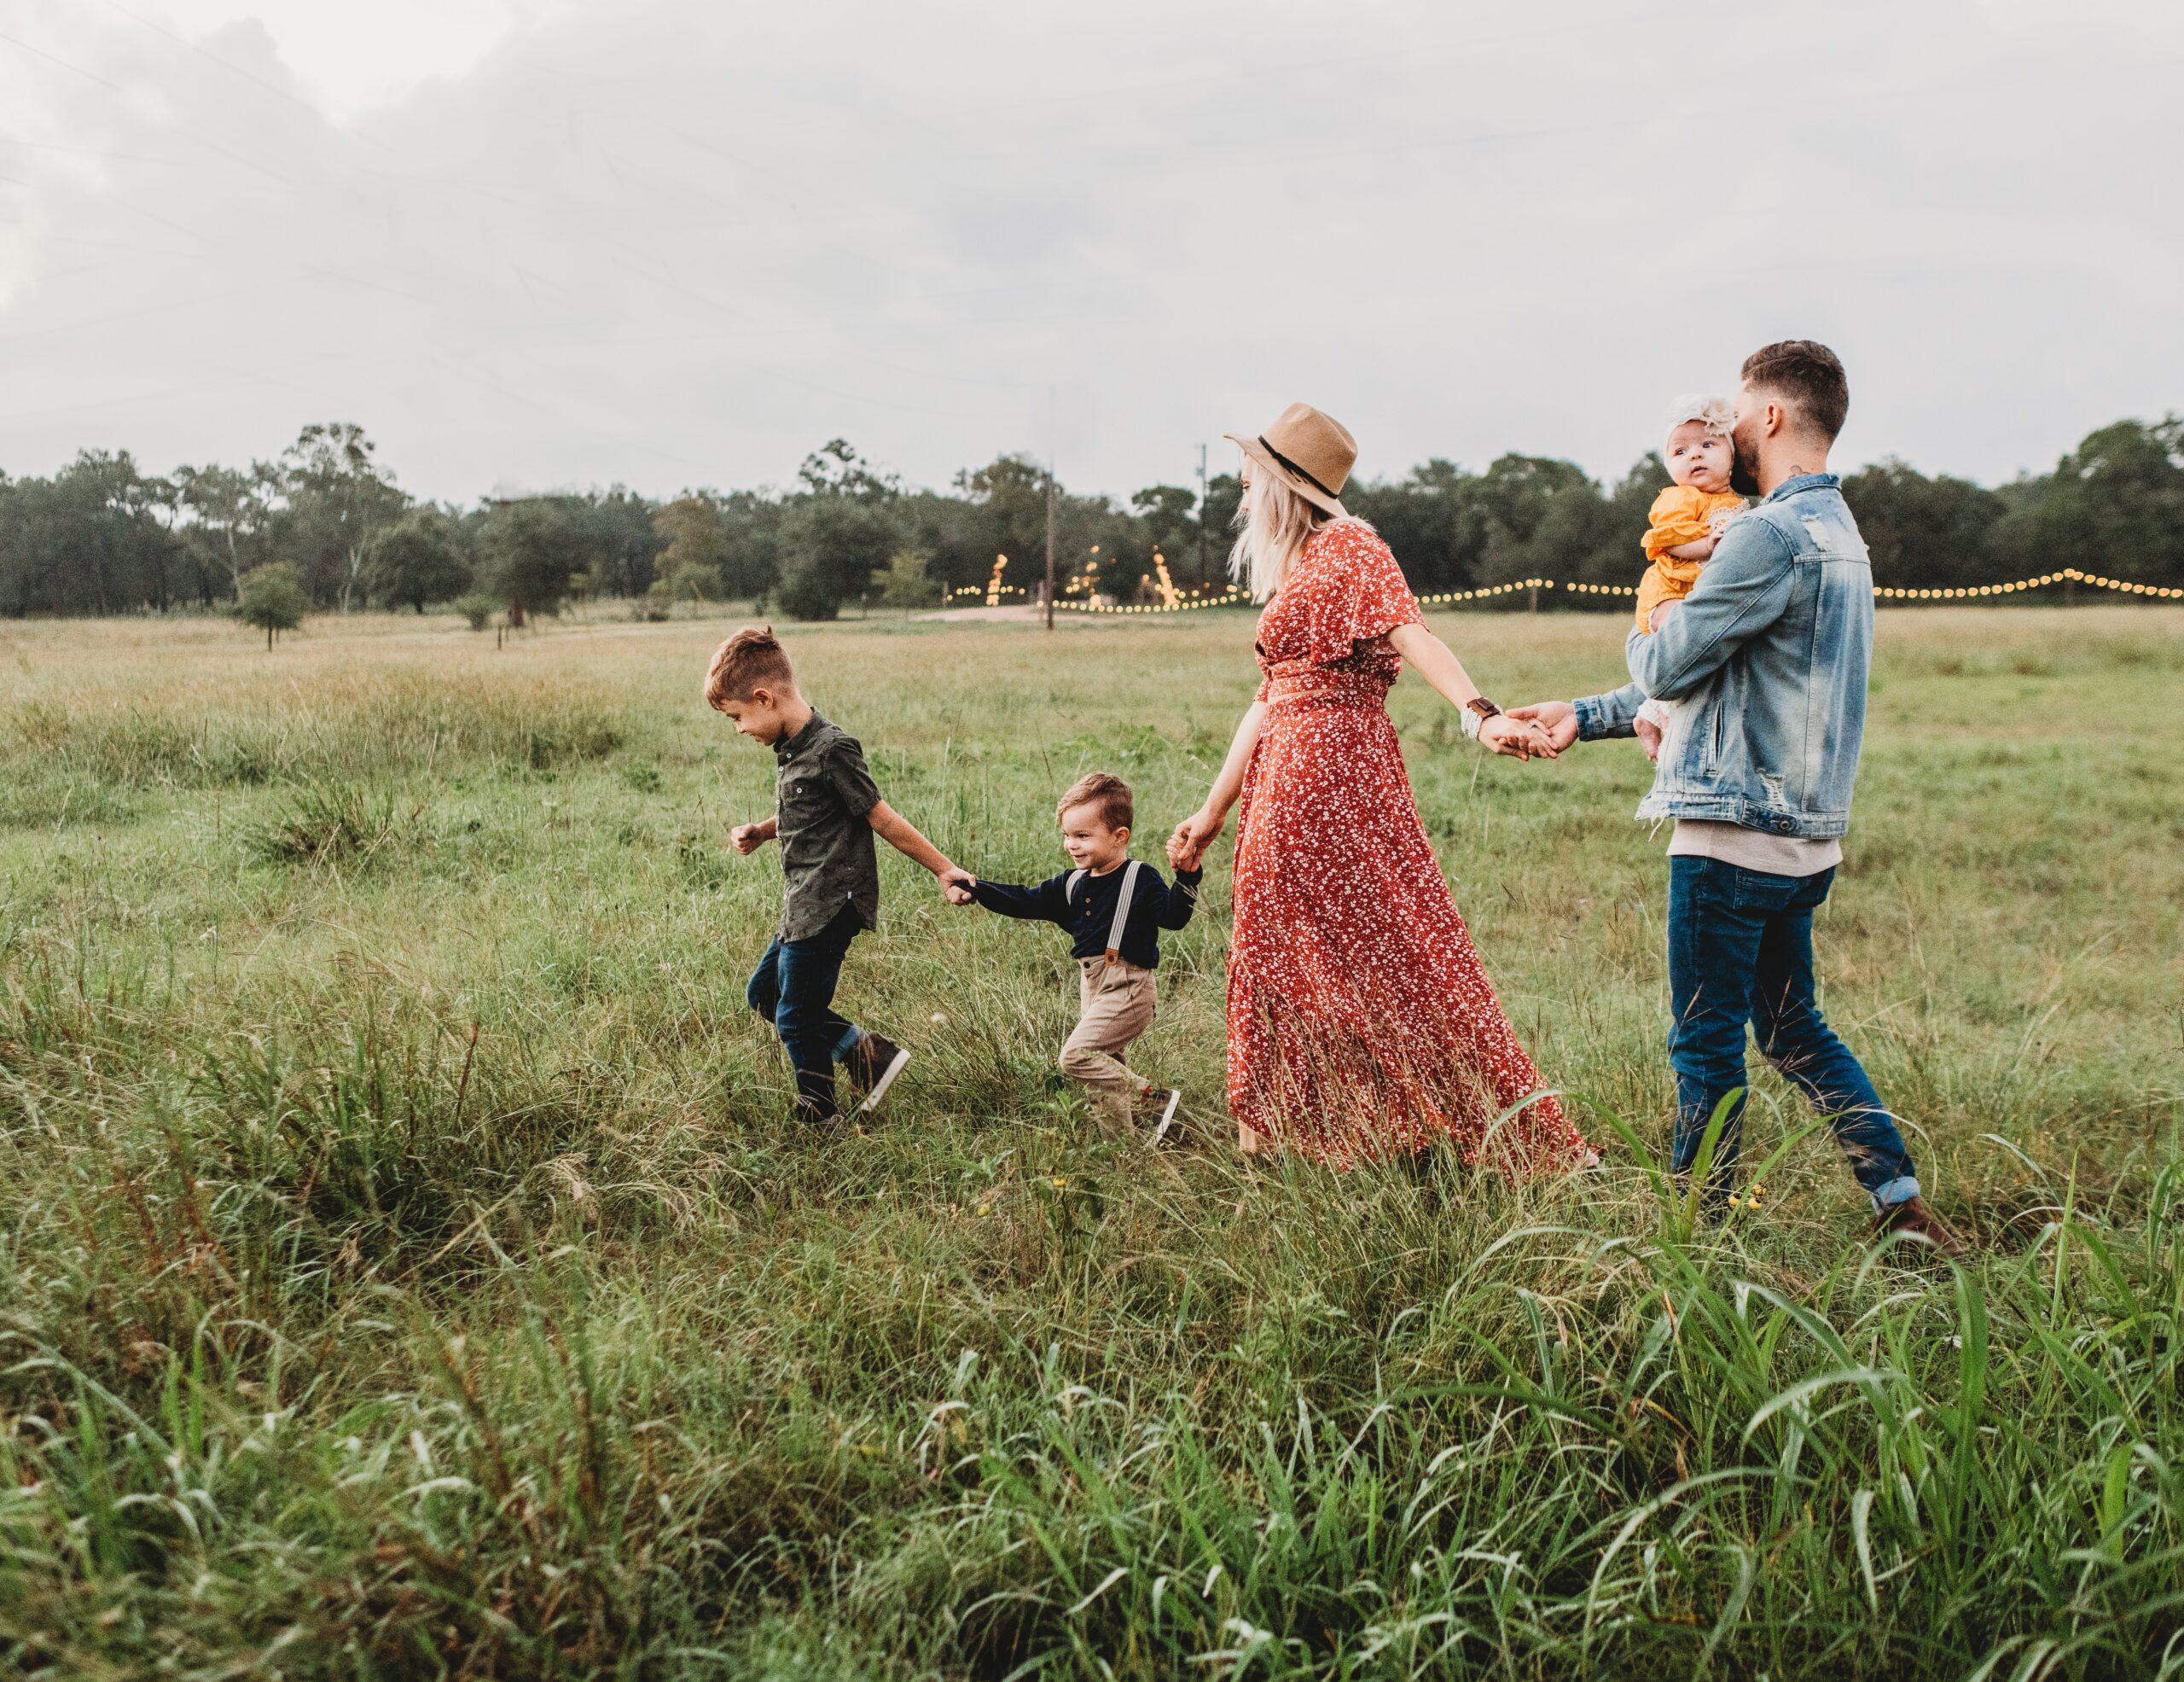 La familia. Salmo 127 y 128